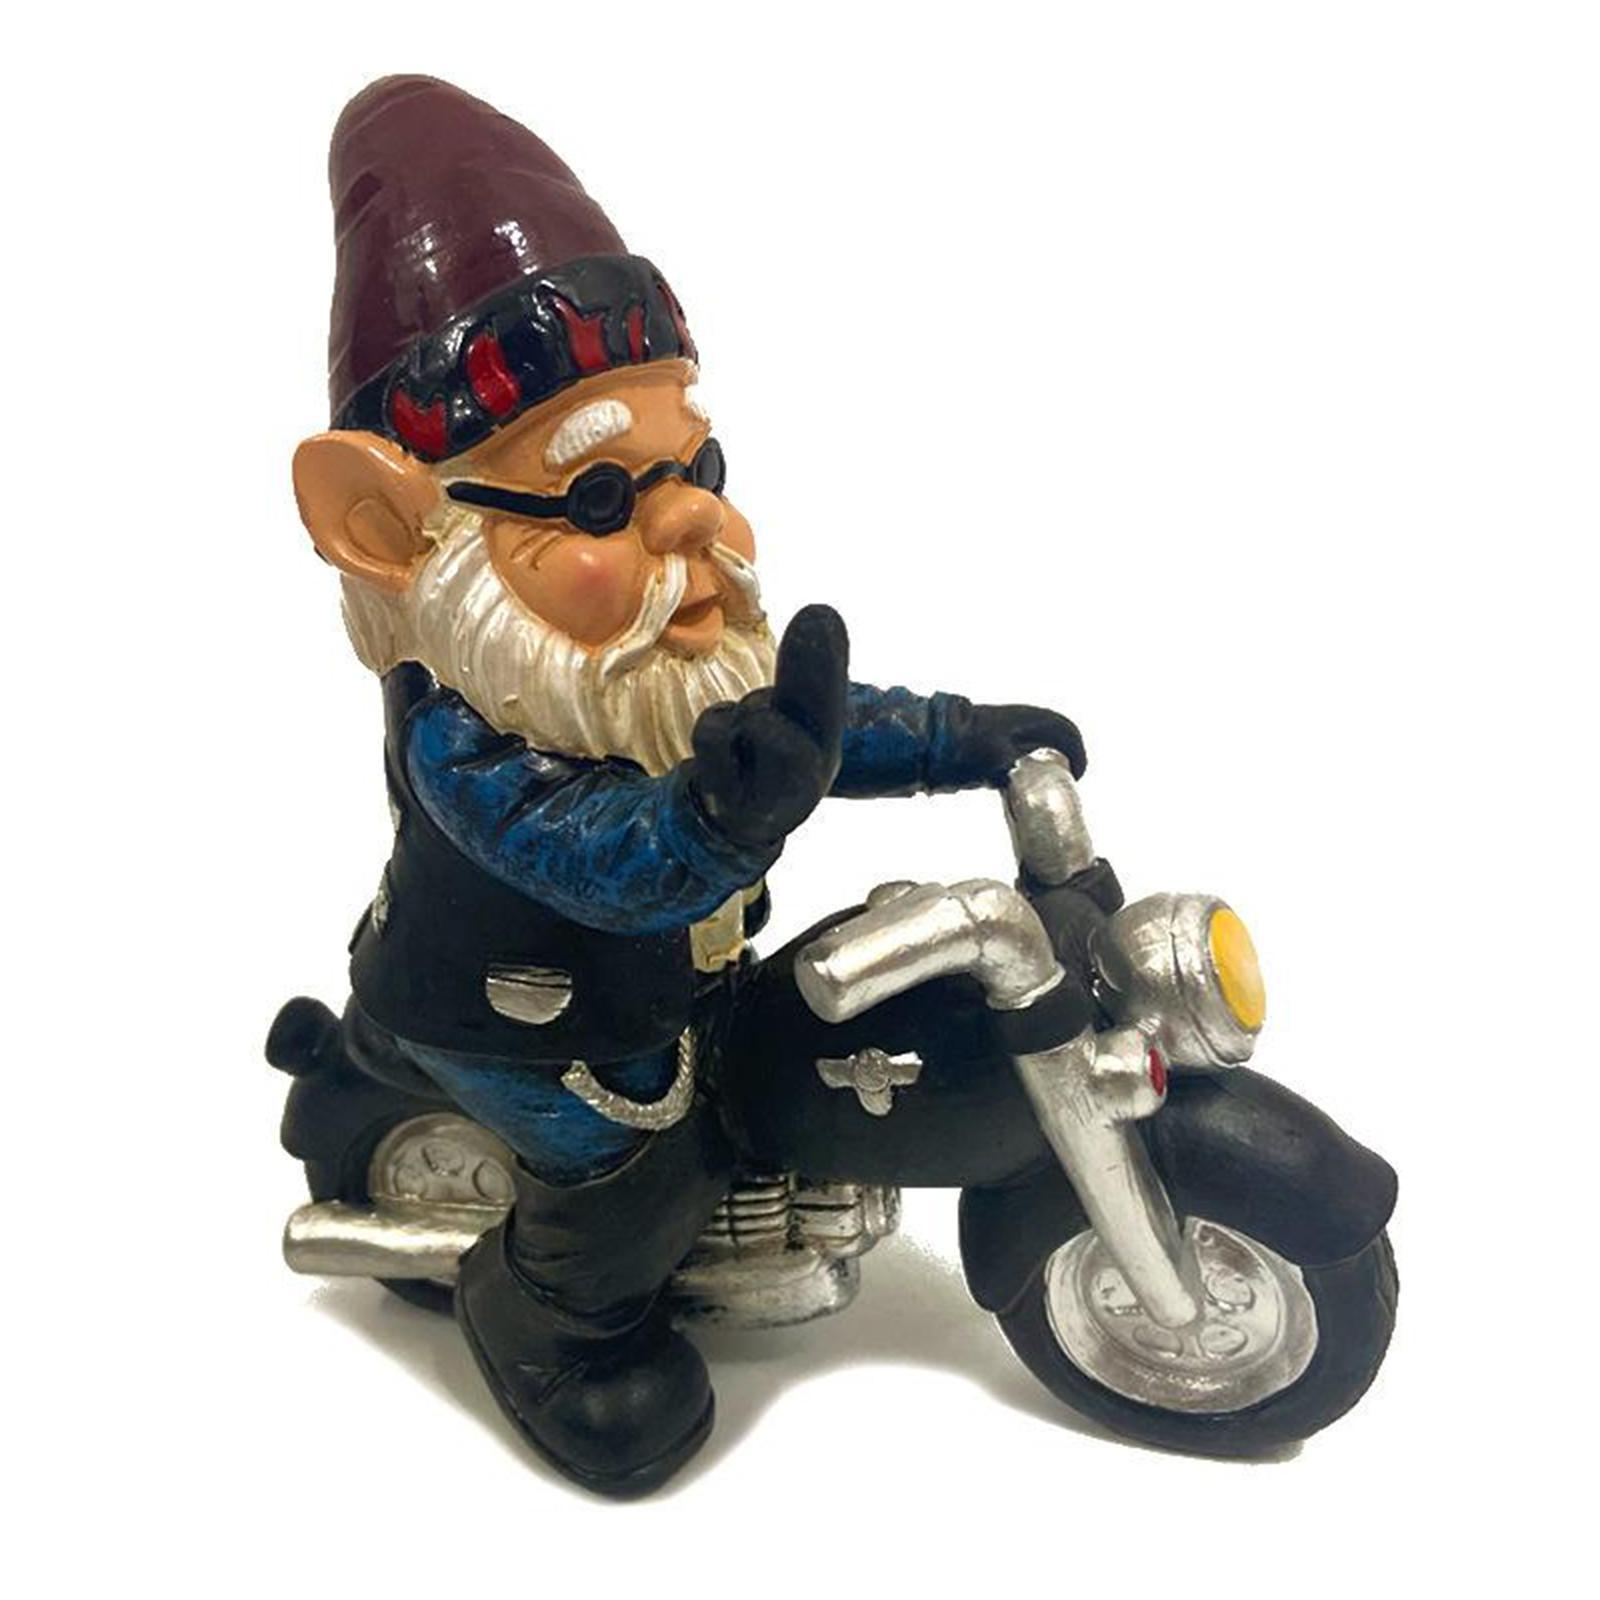 thumbnail 25 - Funny Resin Naughty Garden Gnome Statue Ornaments Villa Home Figurines Decor